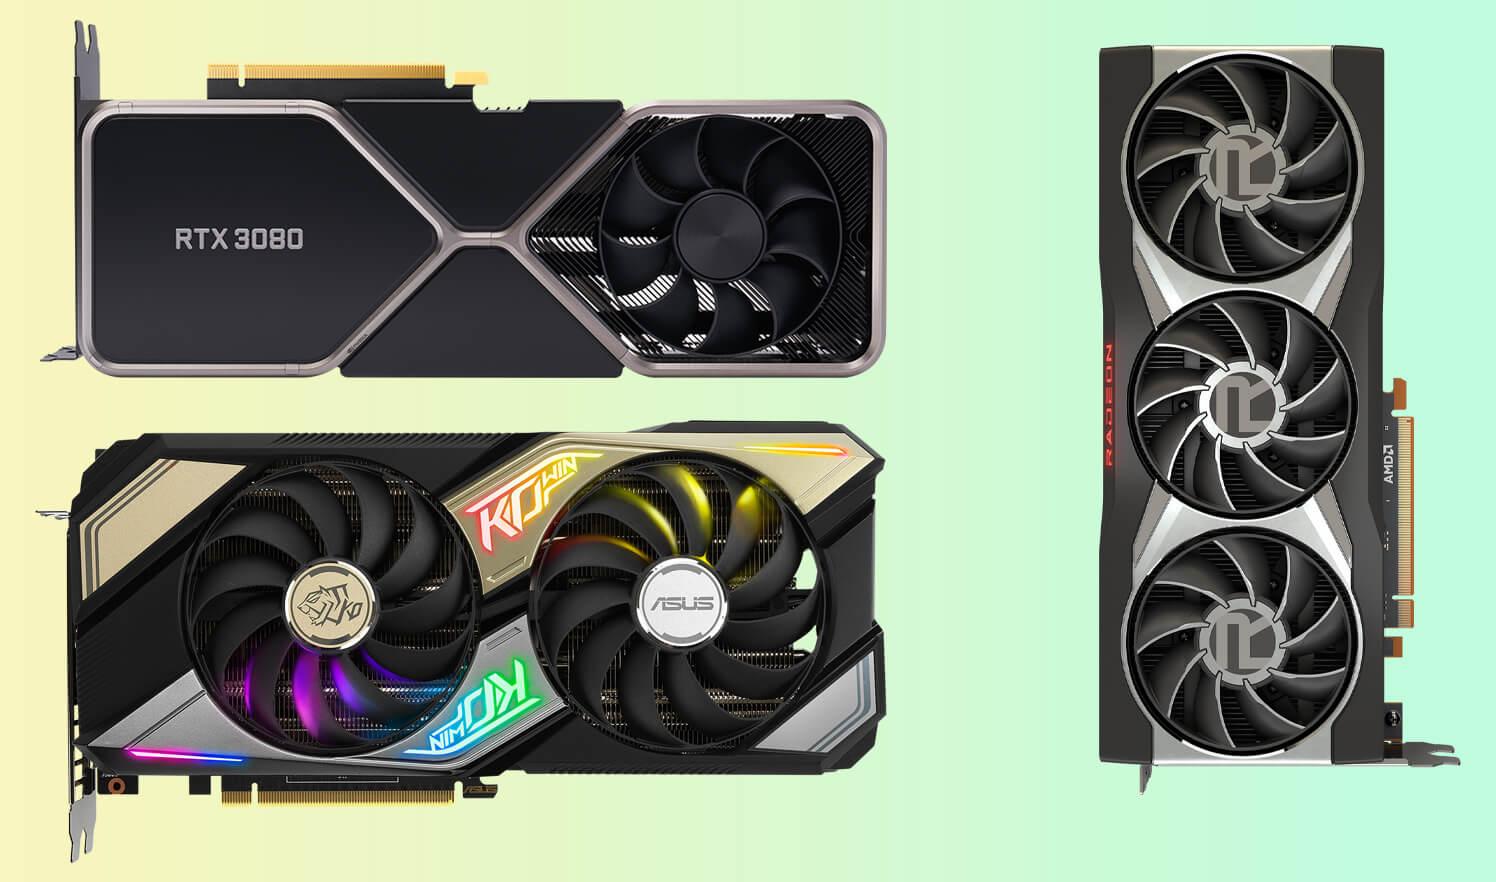 Best Graphics Cards for Ryzen 9 5900x